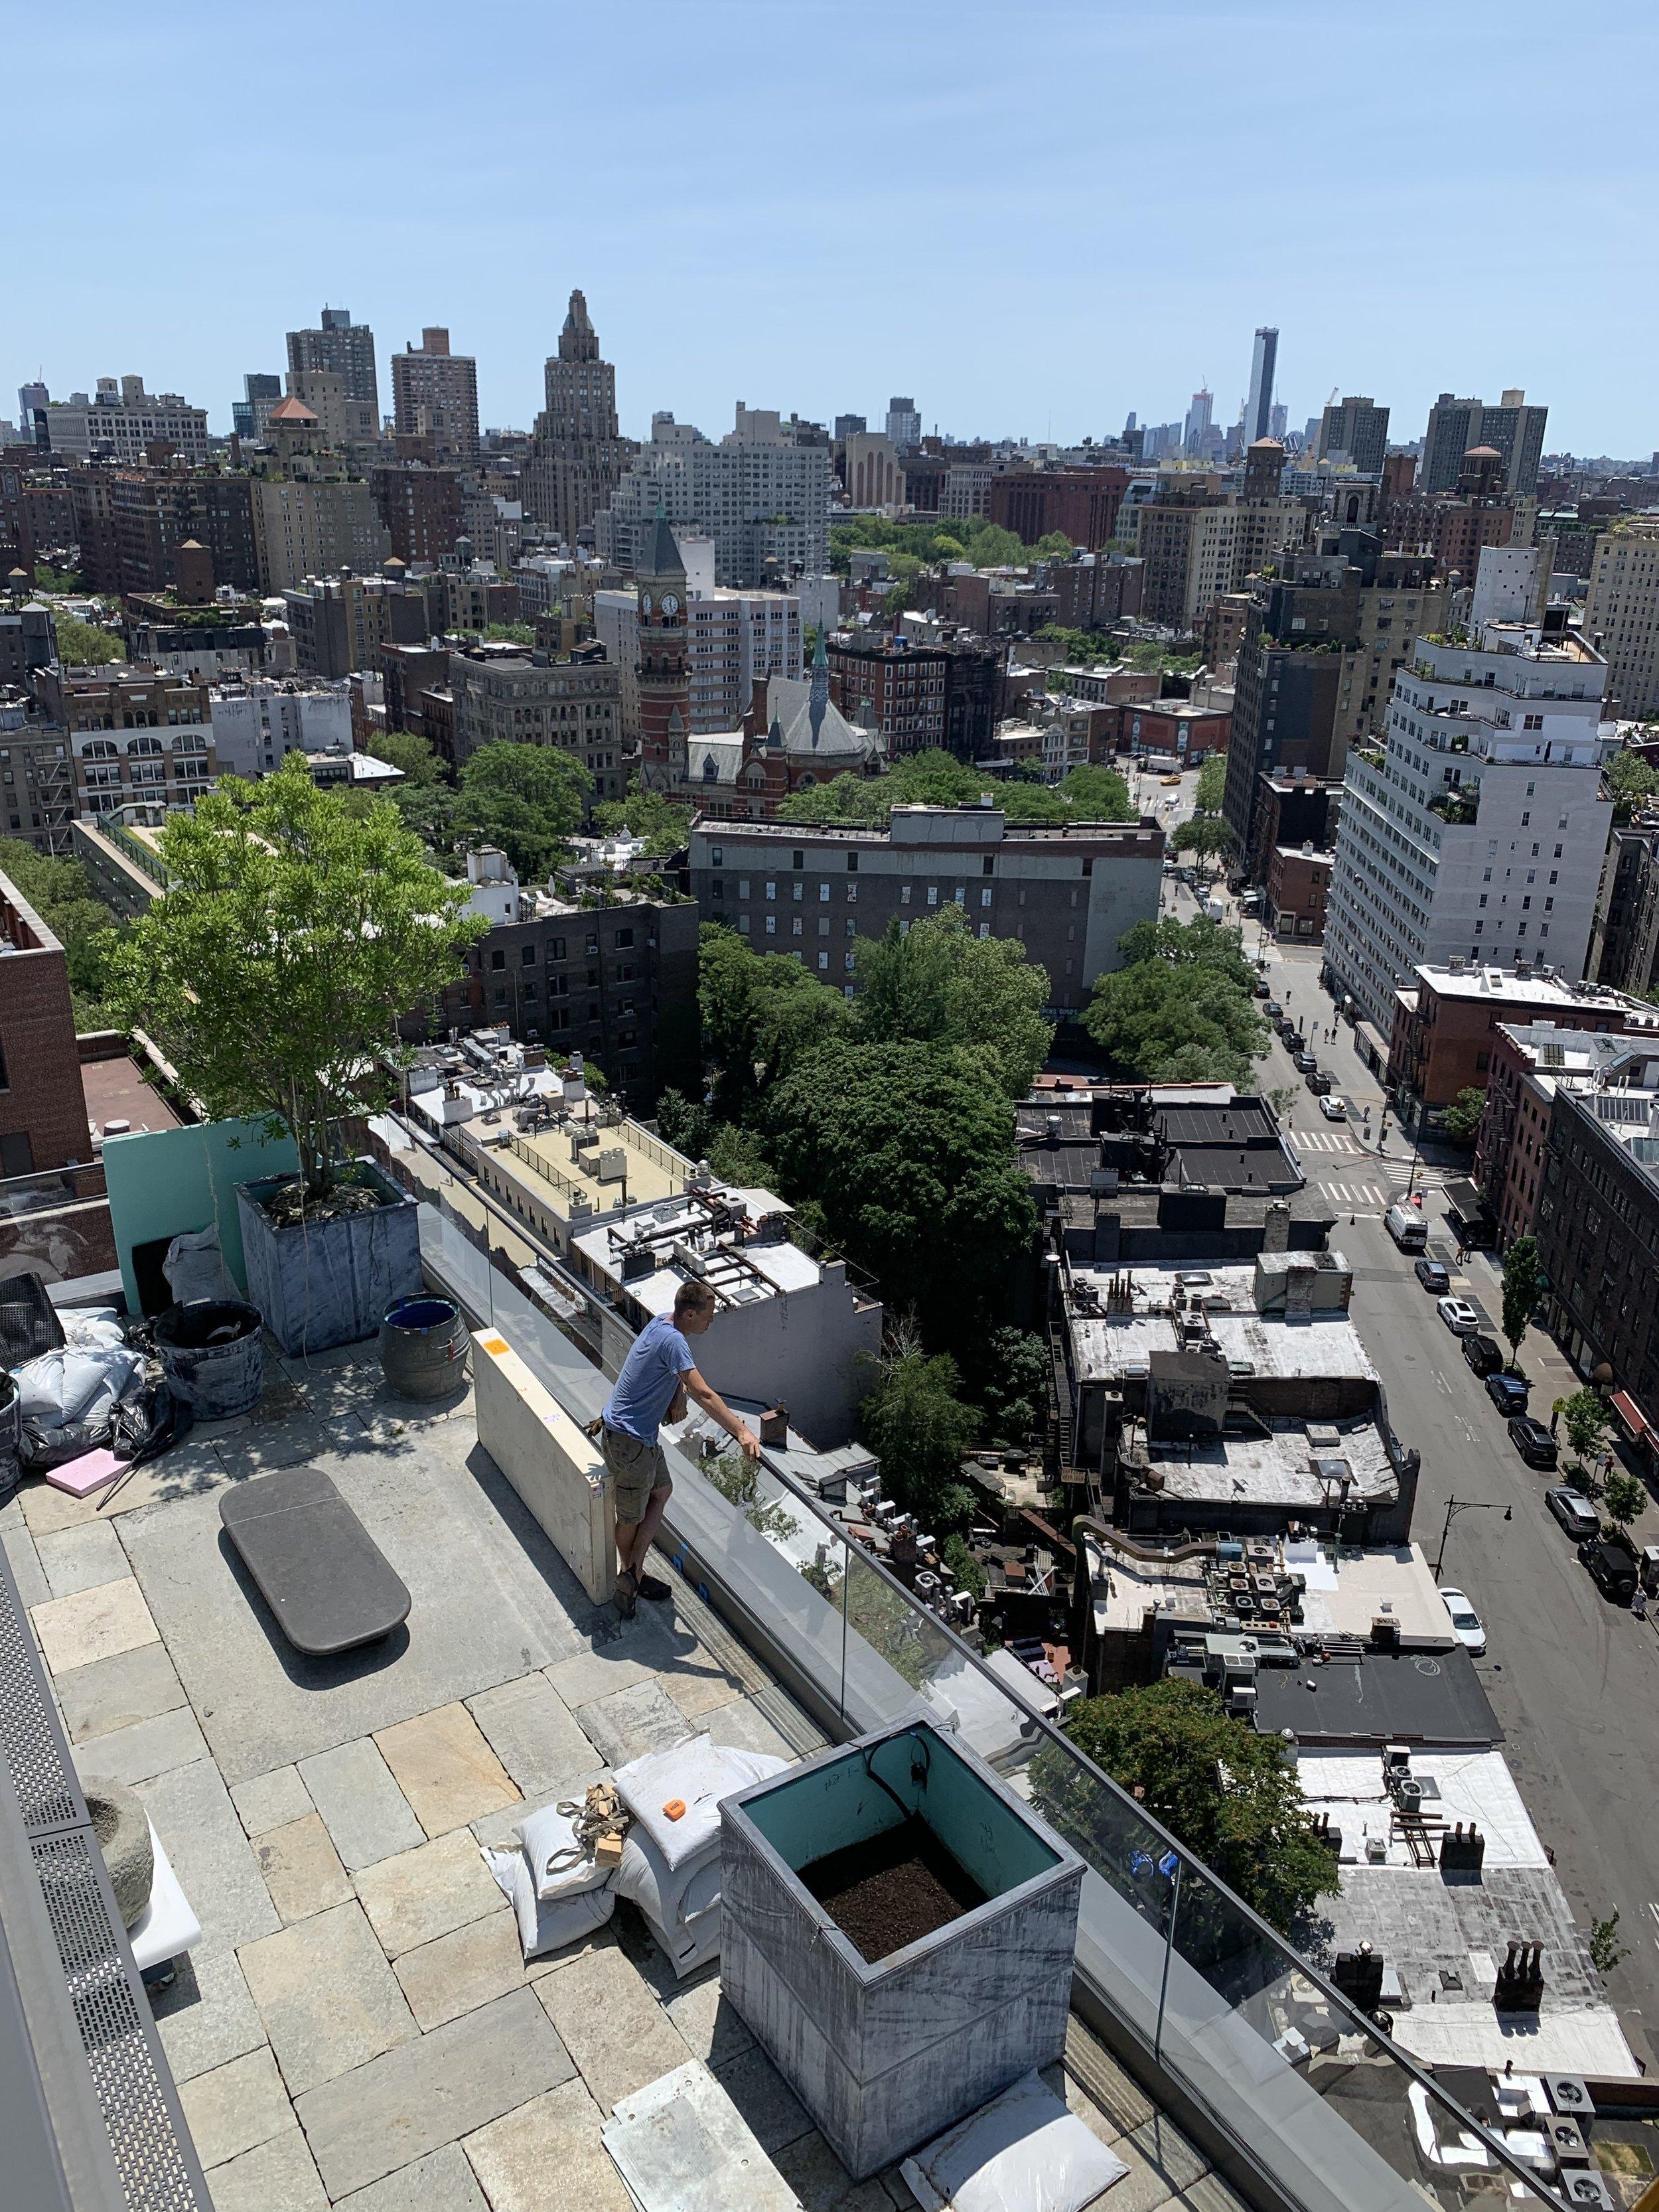 VERDANT, Panorama Terrace, Mac Carbonell designer, Contemporary landscape, New York landscape design